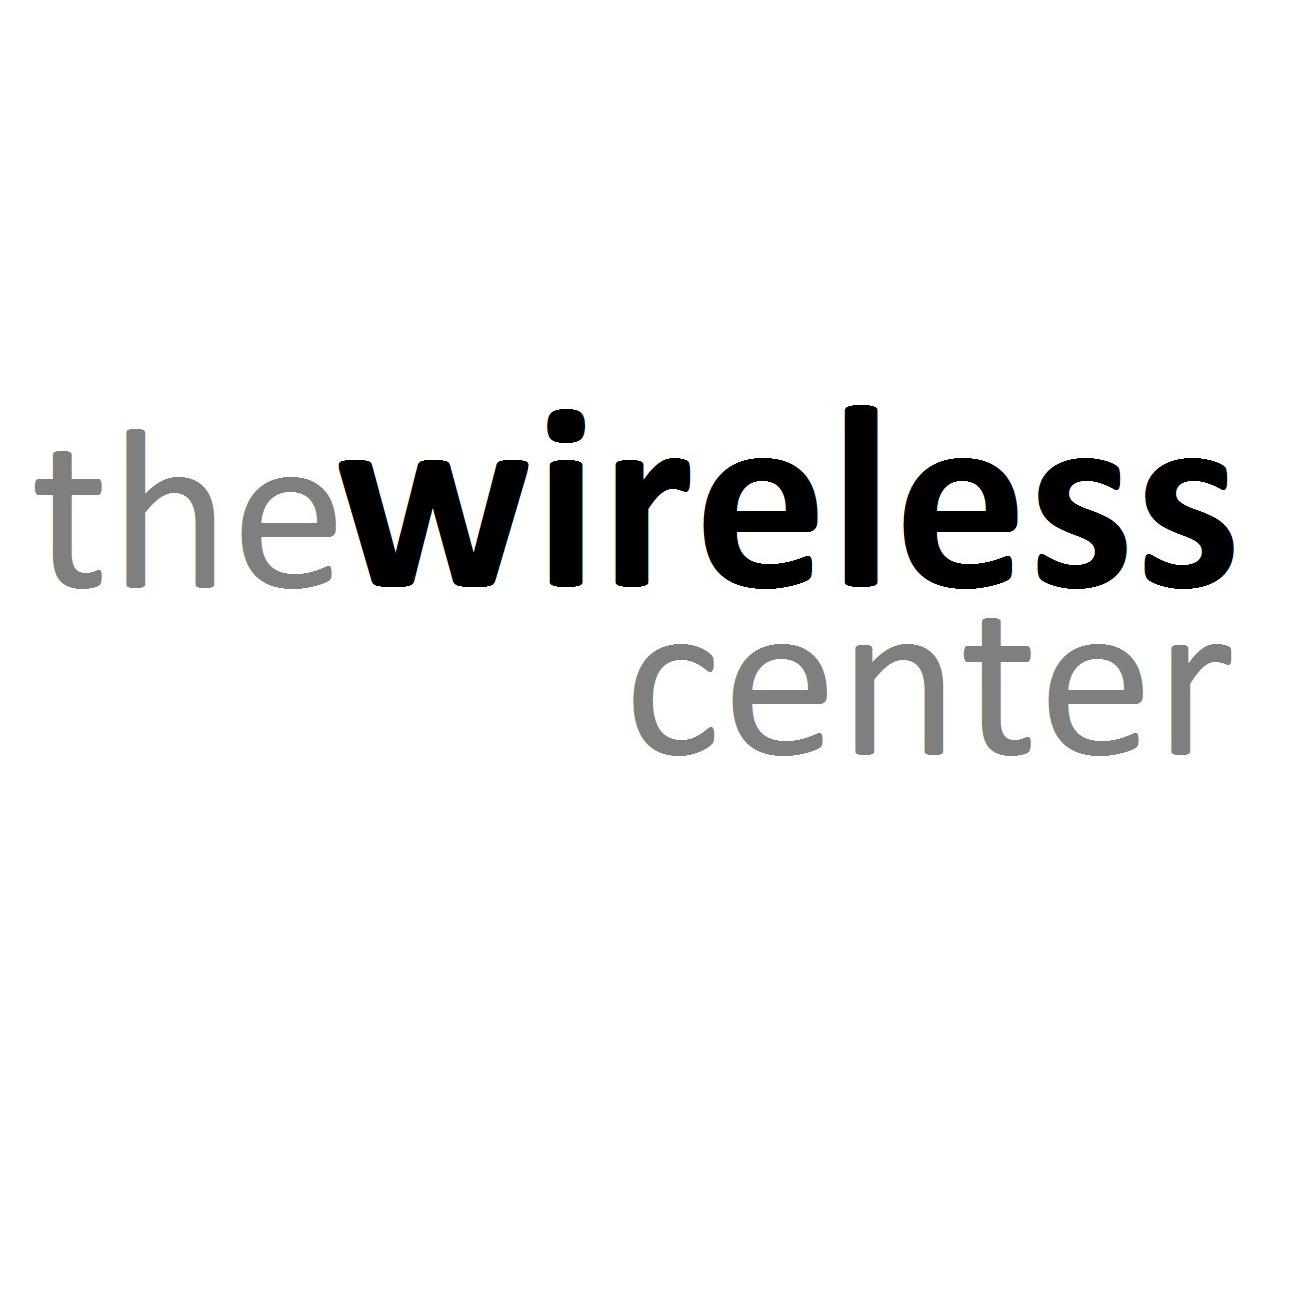 The Wireless Center